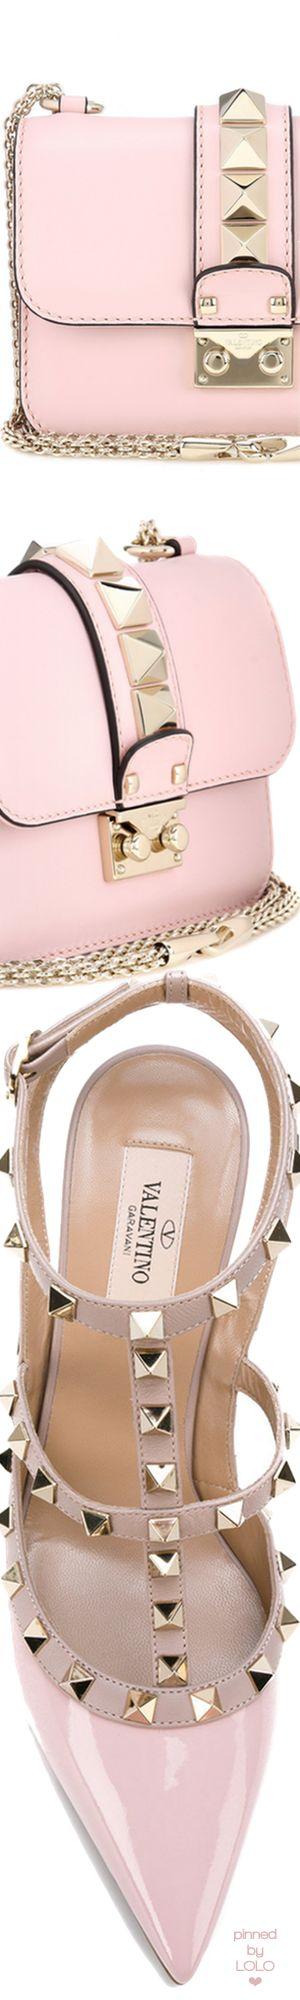 Valentino Garavani Lock Small leather shoulder bag and Rockstud Pump